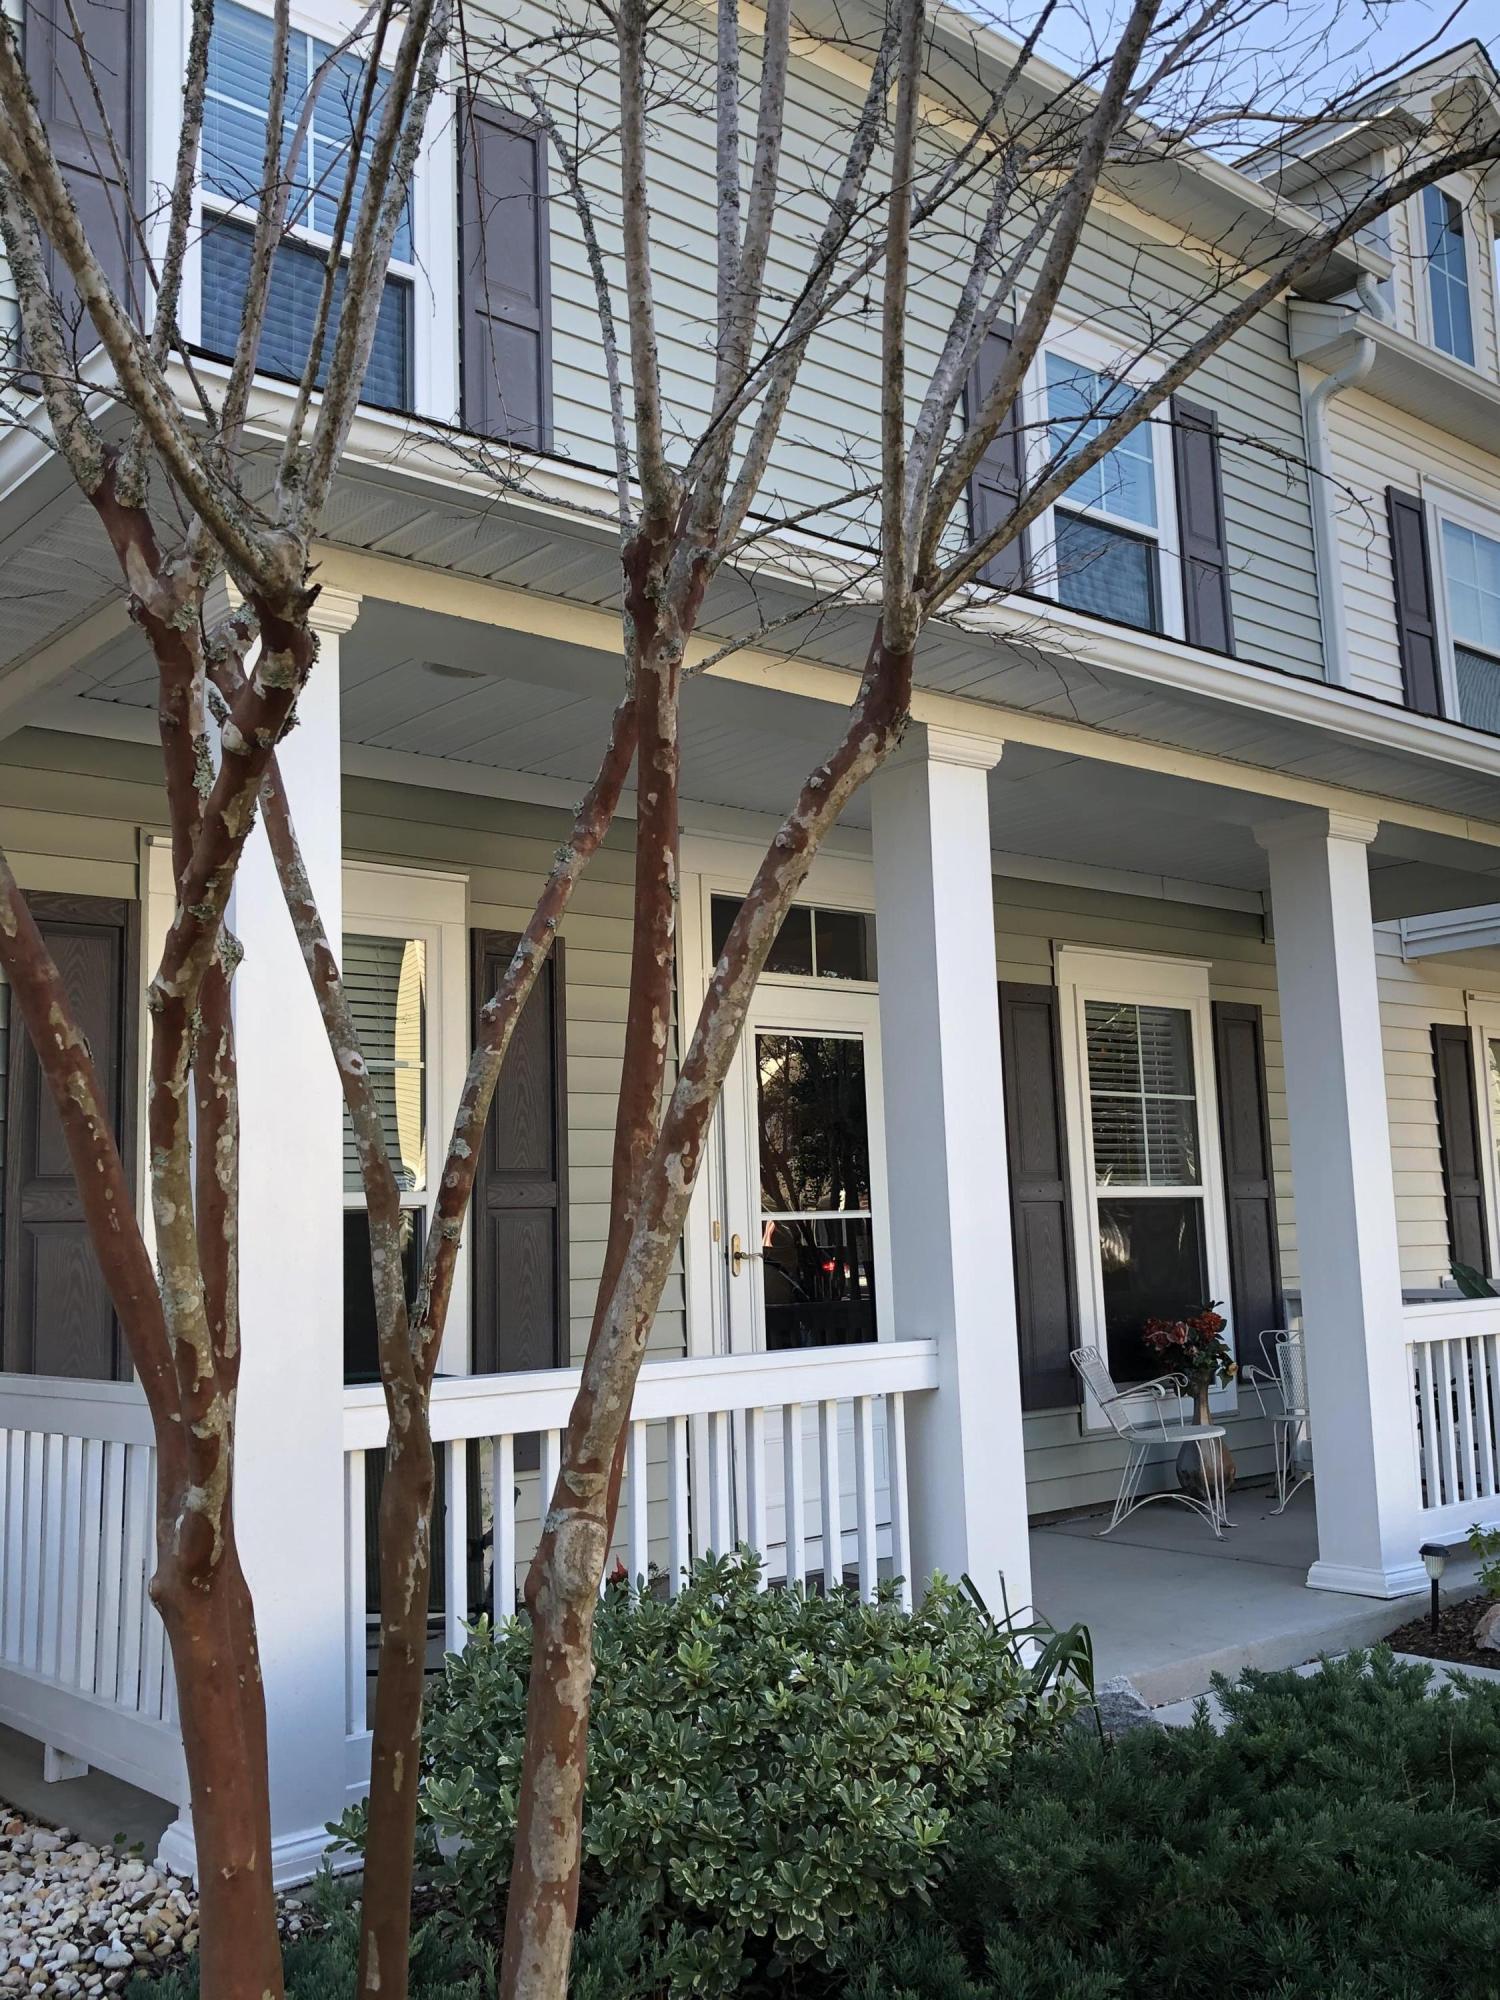 Boltons Landing Homes For Sale - 1445 Nautical Chart, Charleston, SC - 34